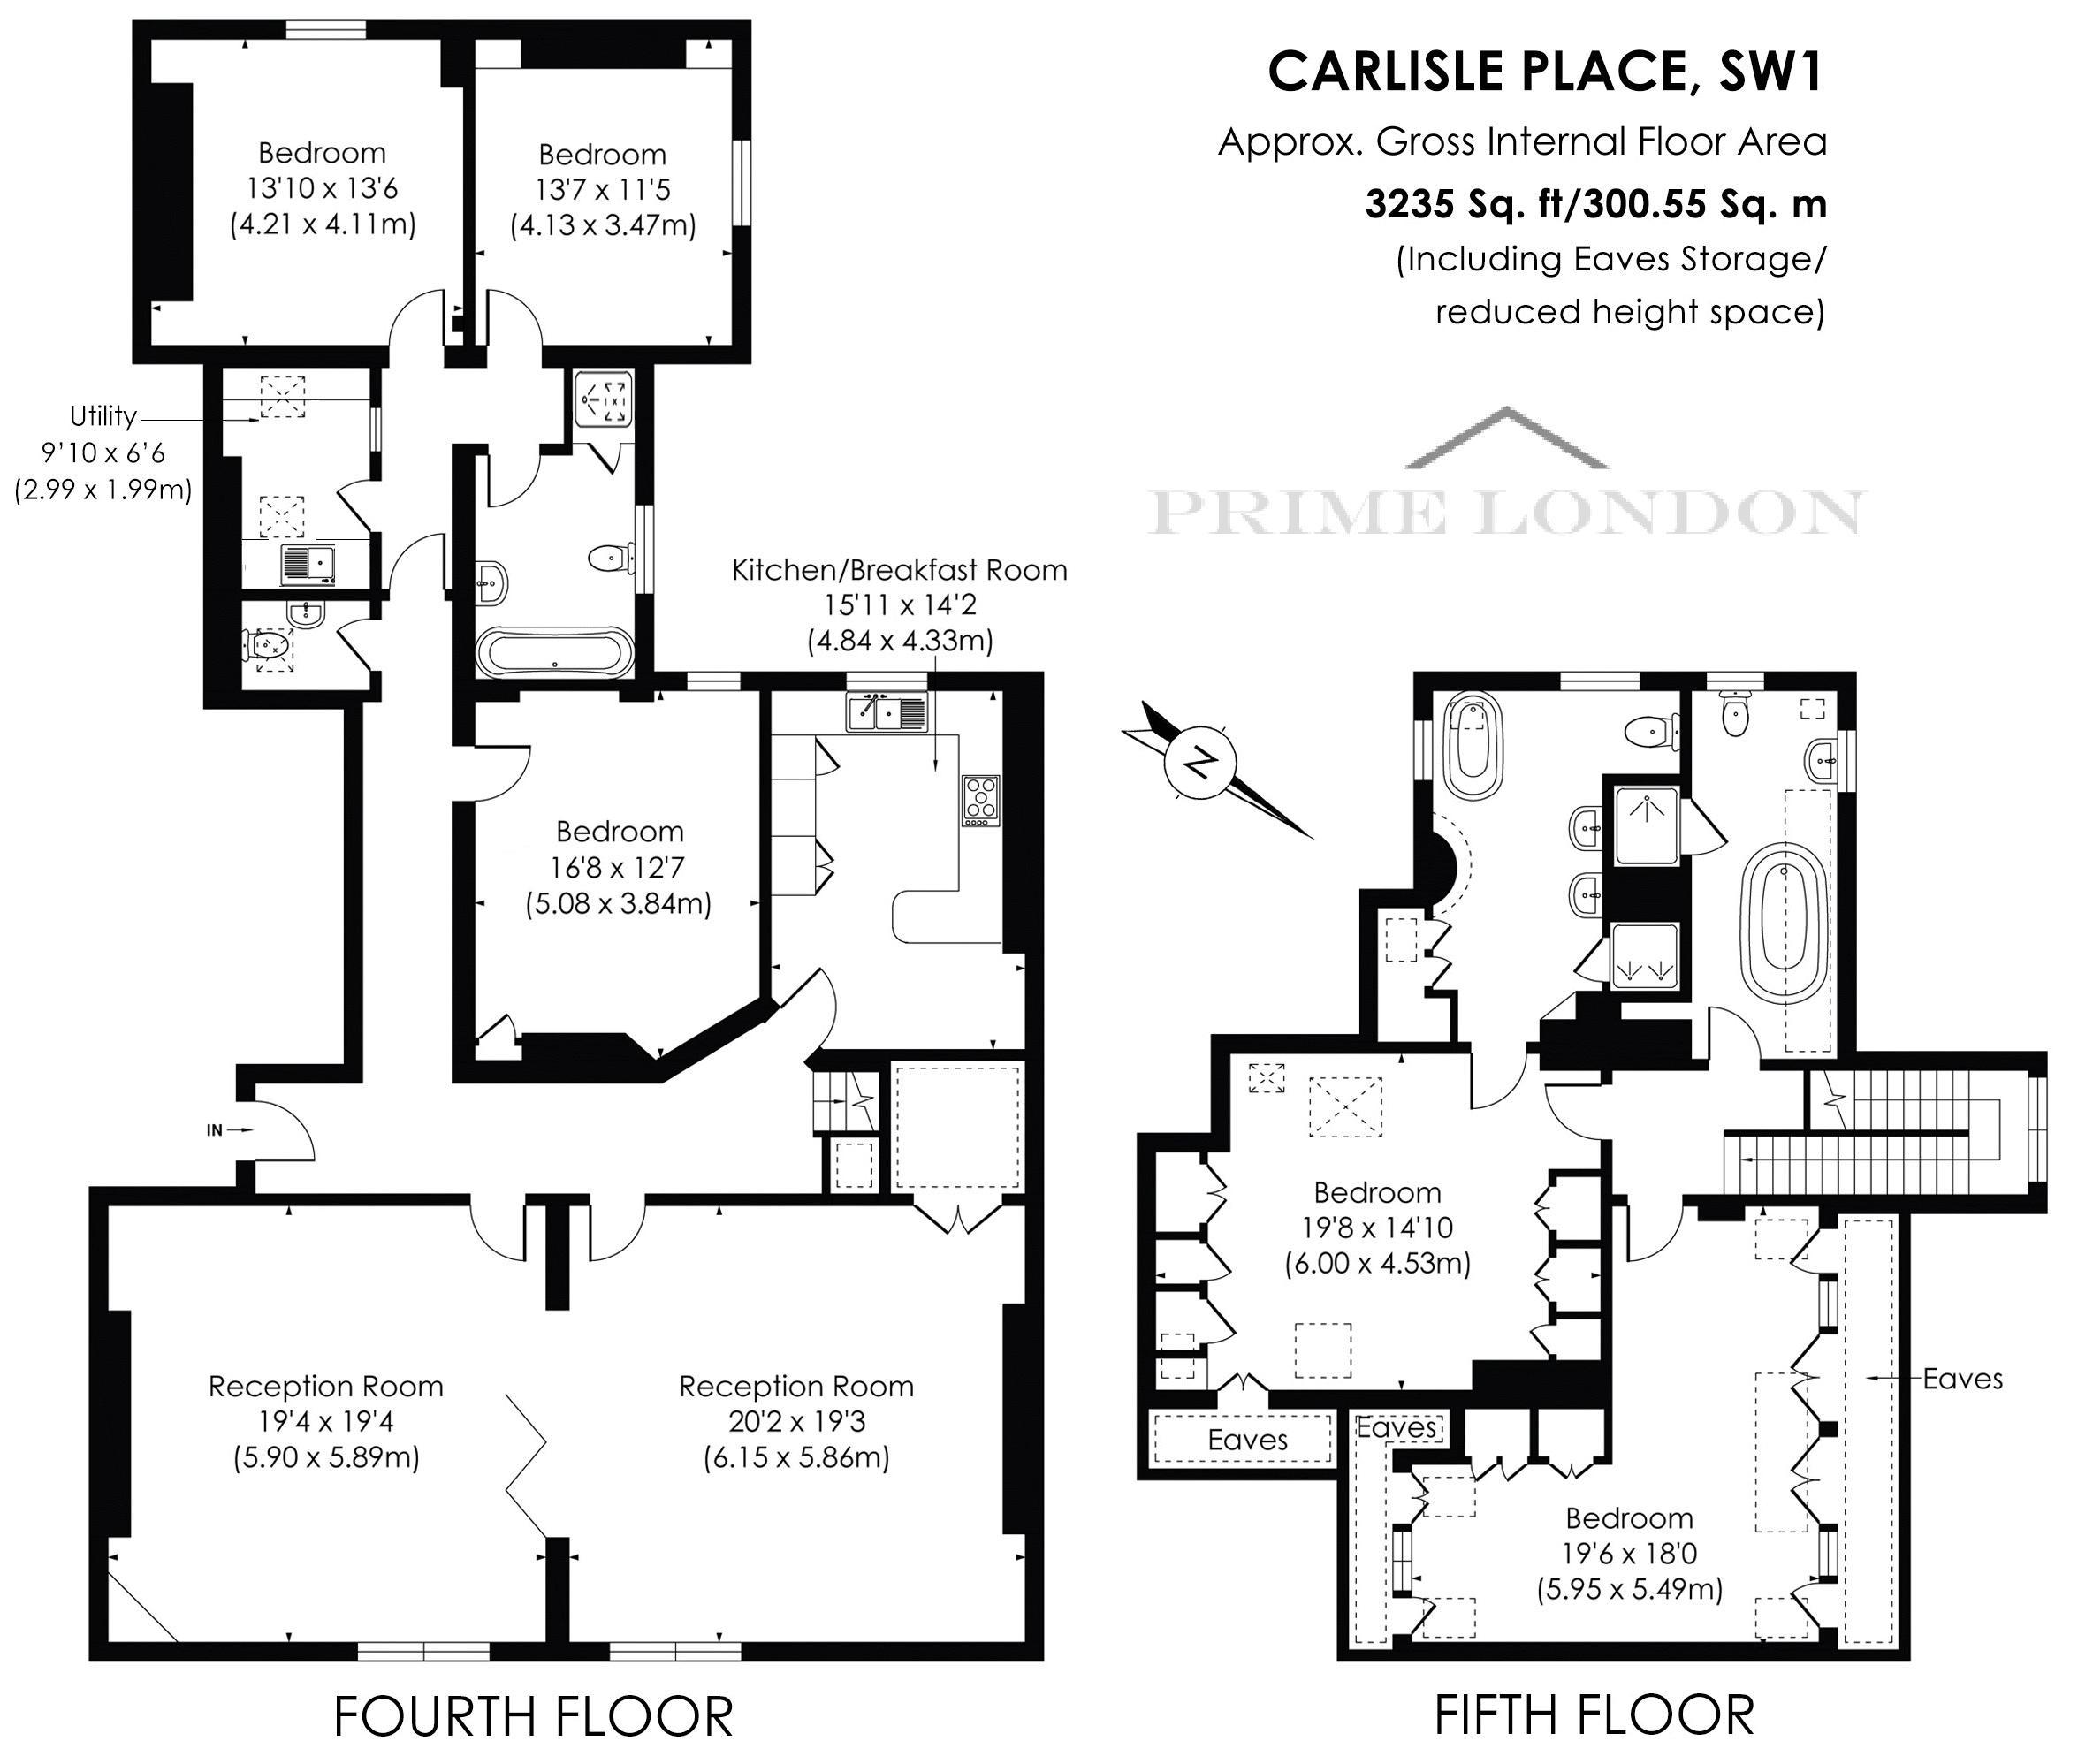 Carlisle Mansions Carlisle Place